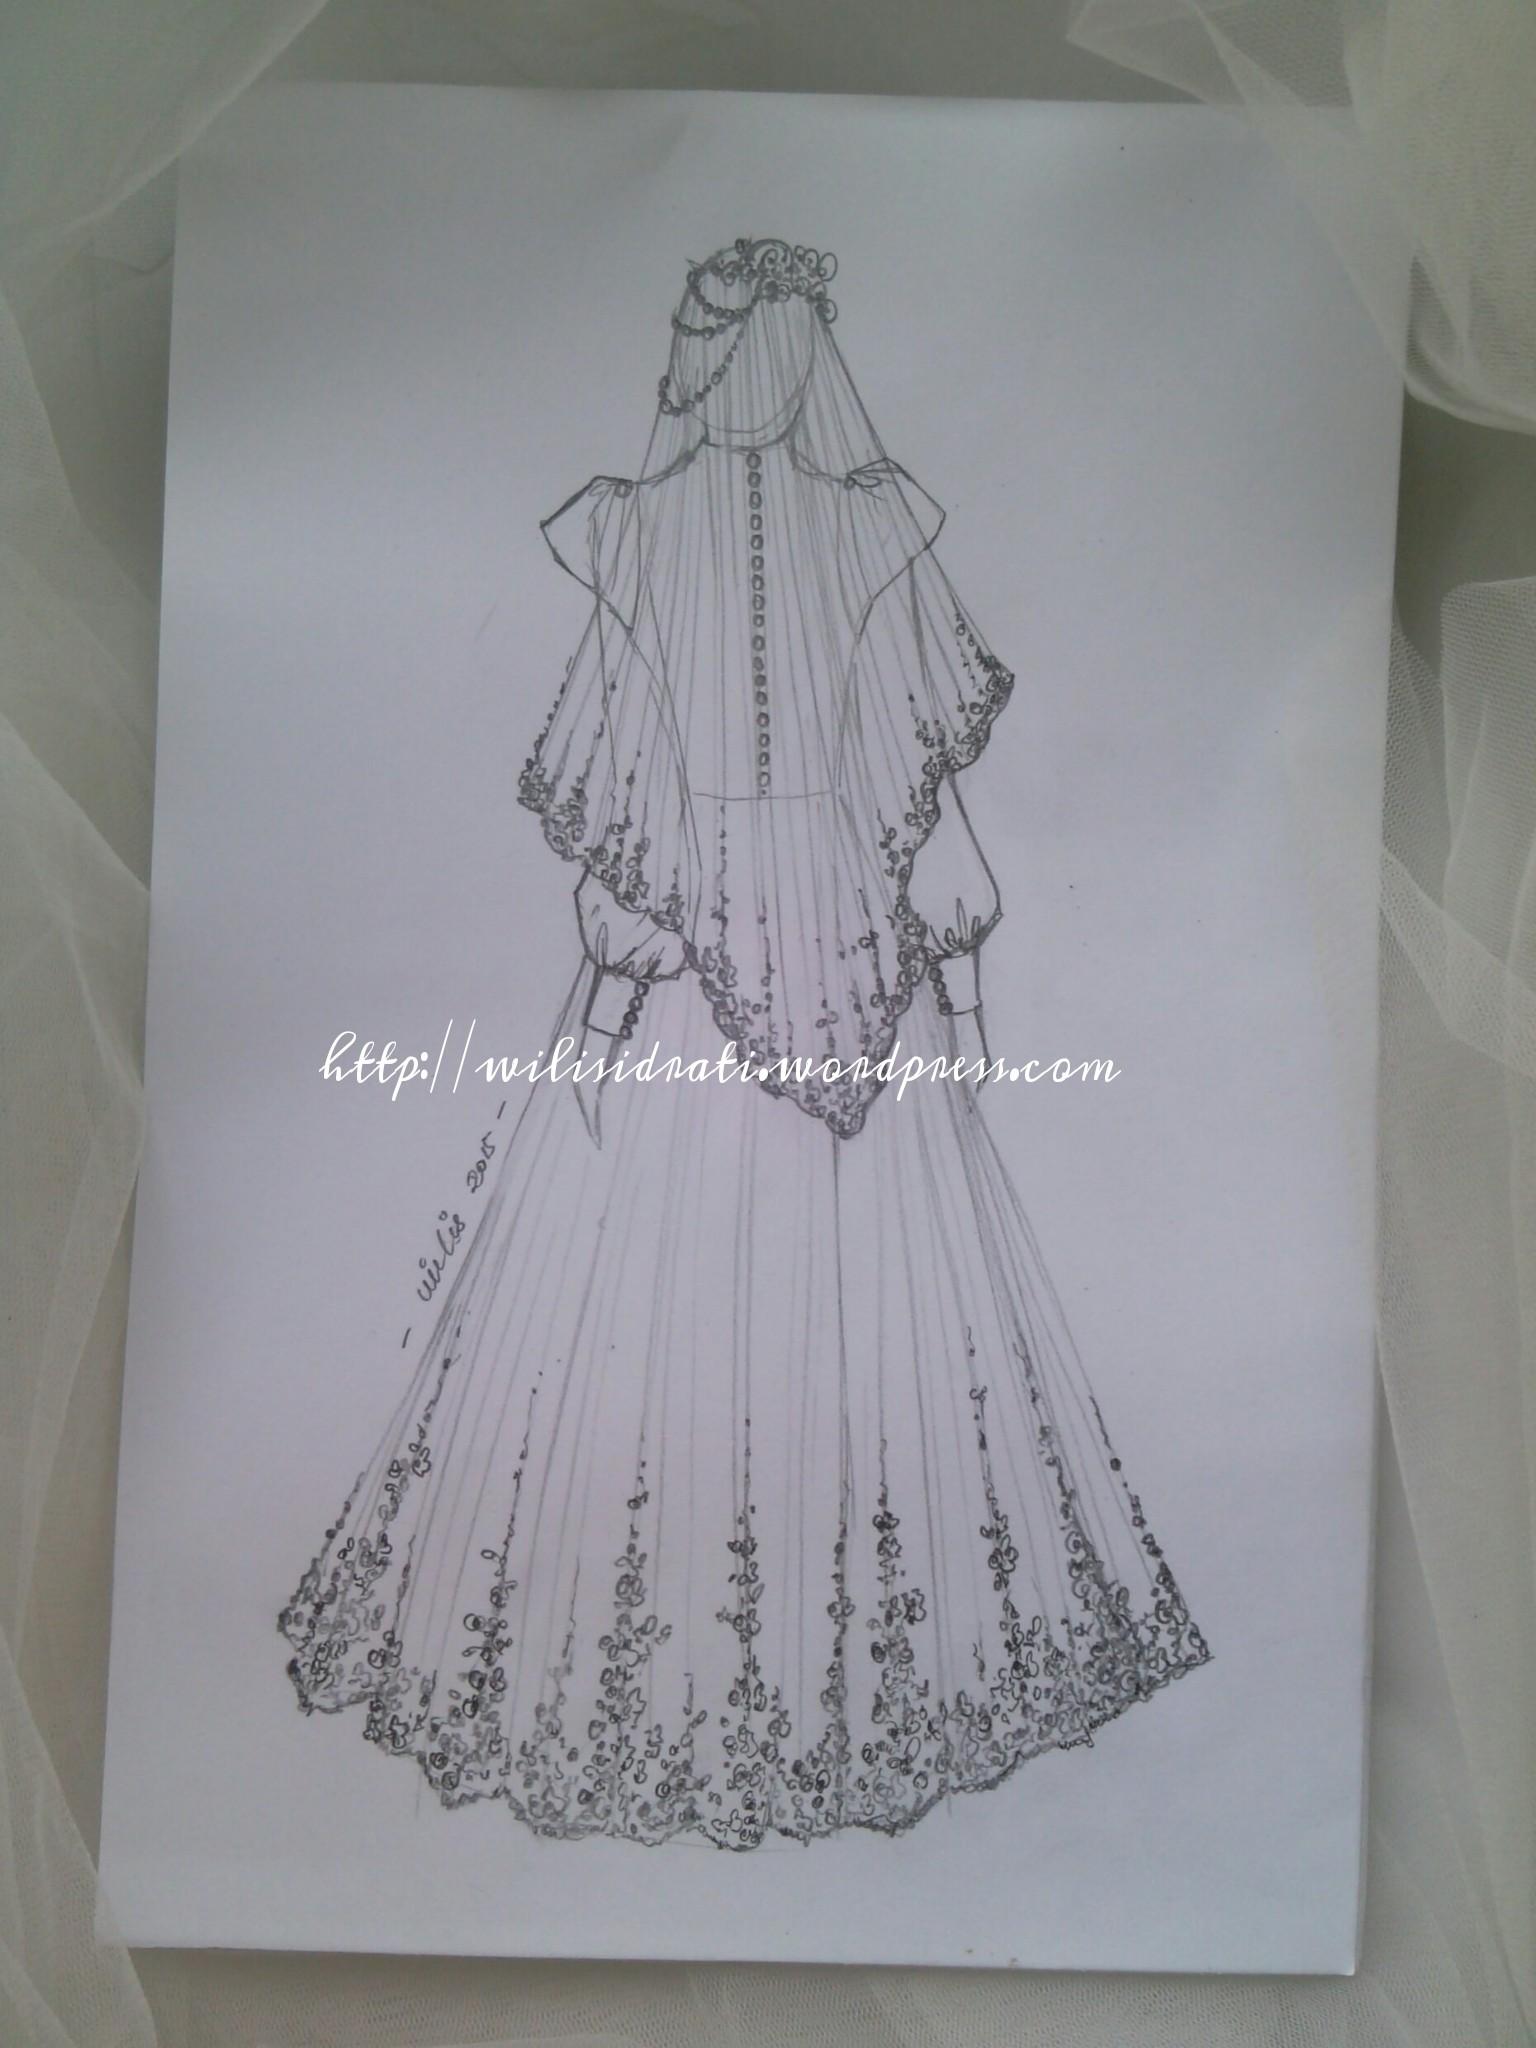 Kumpulan Contoh Gambar Sketsa Baju Gamis Informasi Masa Kini